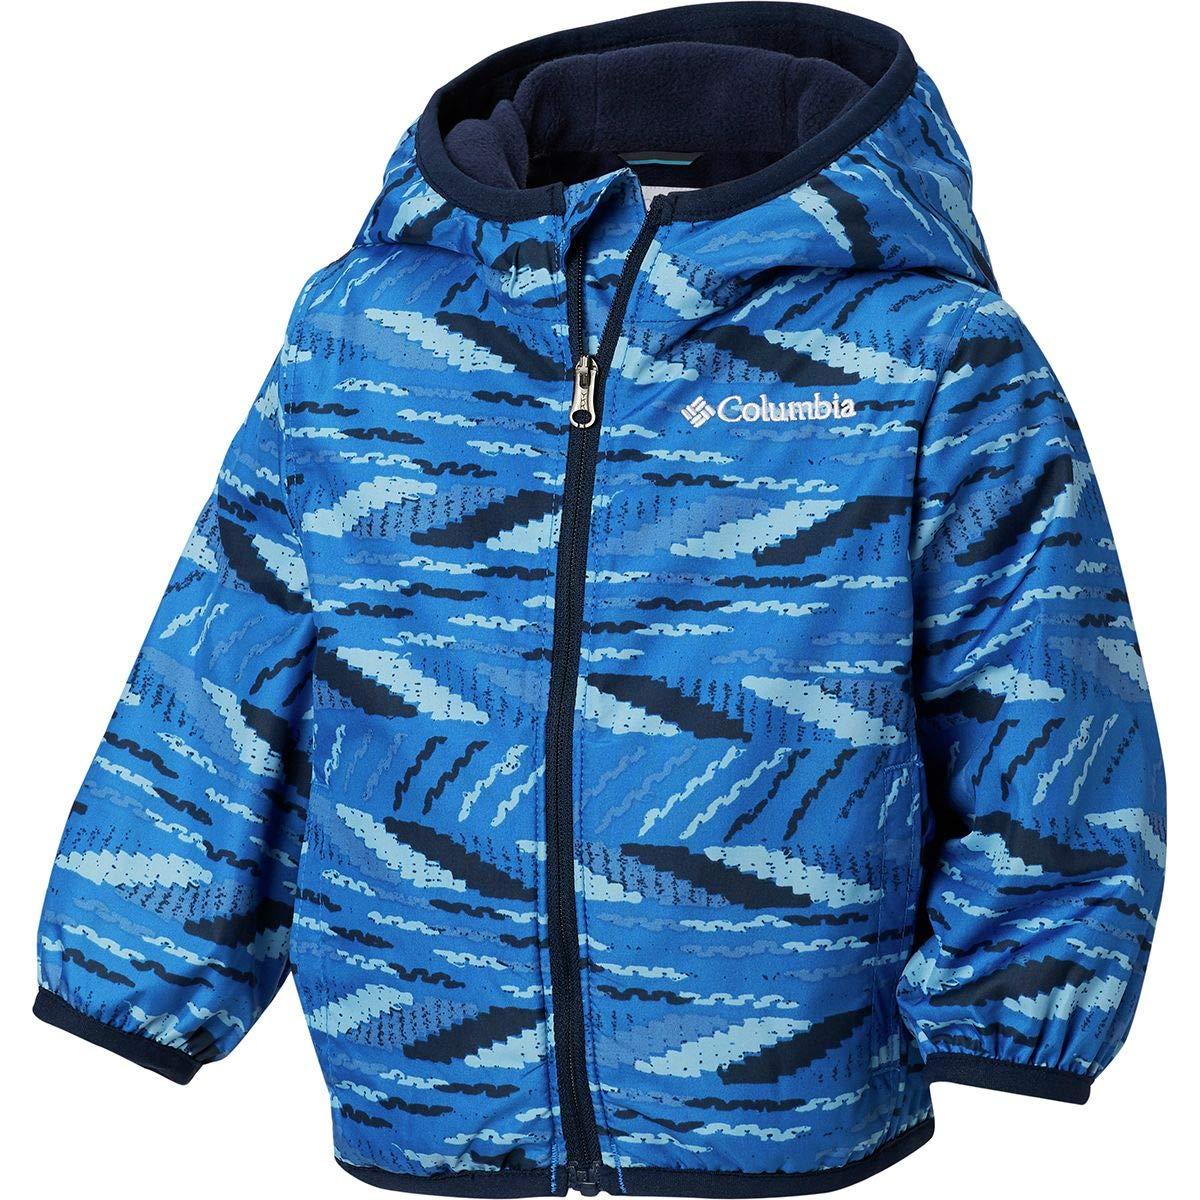 Columbia Kids Baby Boy's Mini Pixel Grabber¿ II Wind Jacket (Infant/Toddler) Super Blue Beach Stripe 6-12 Months